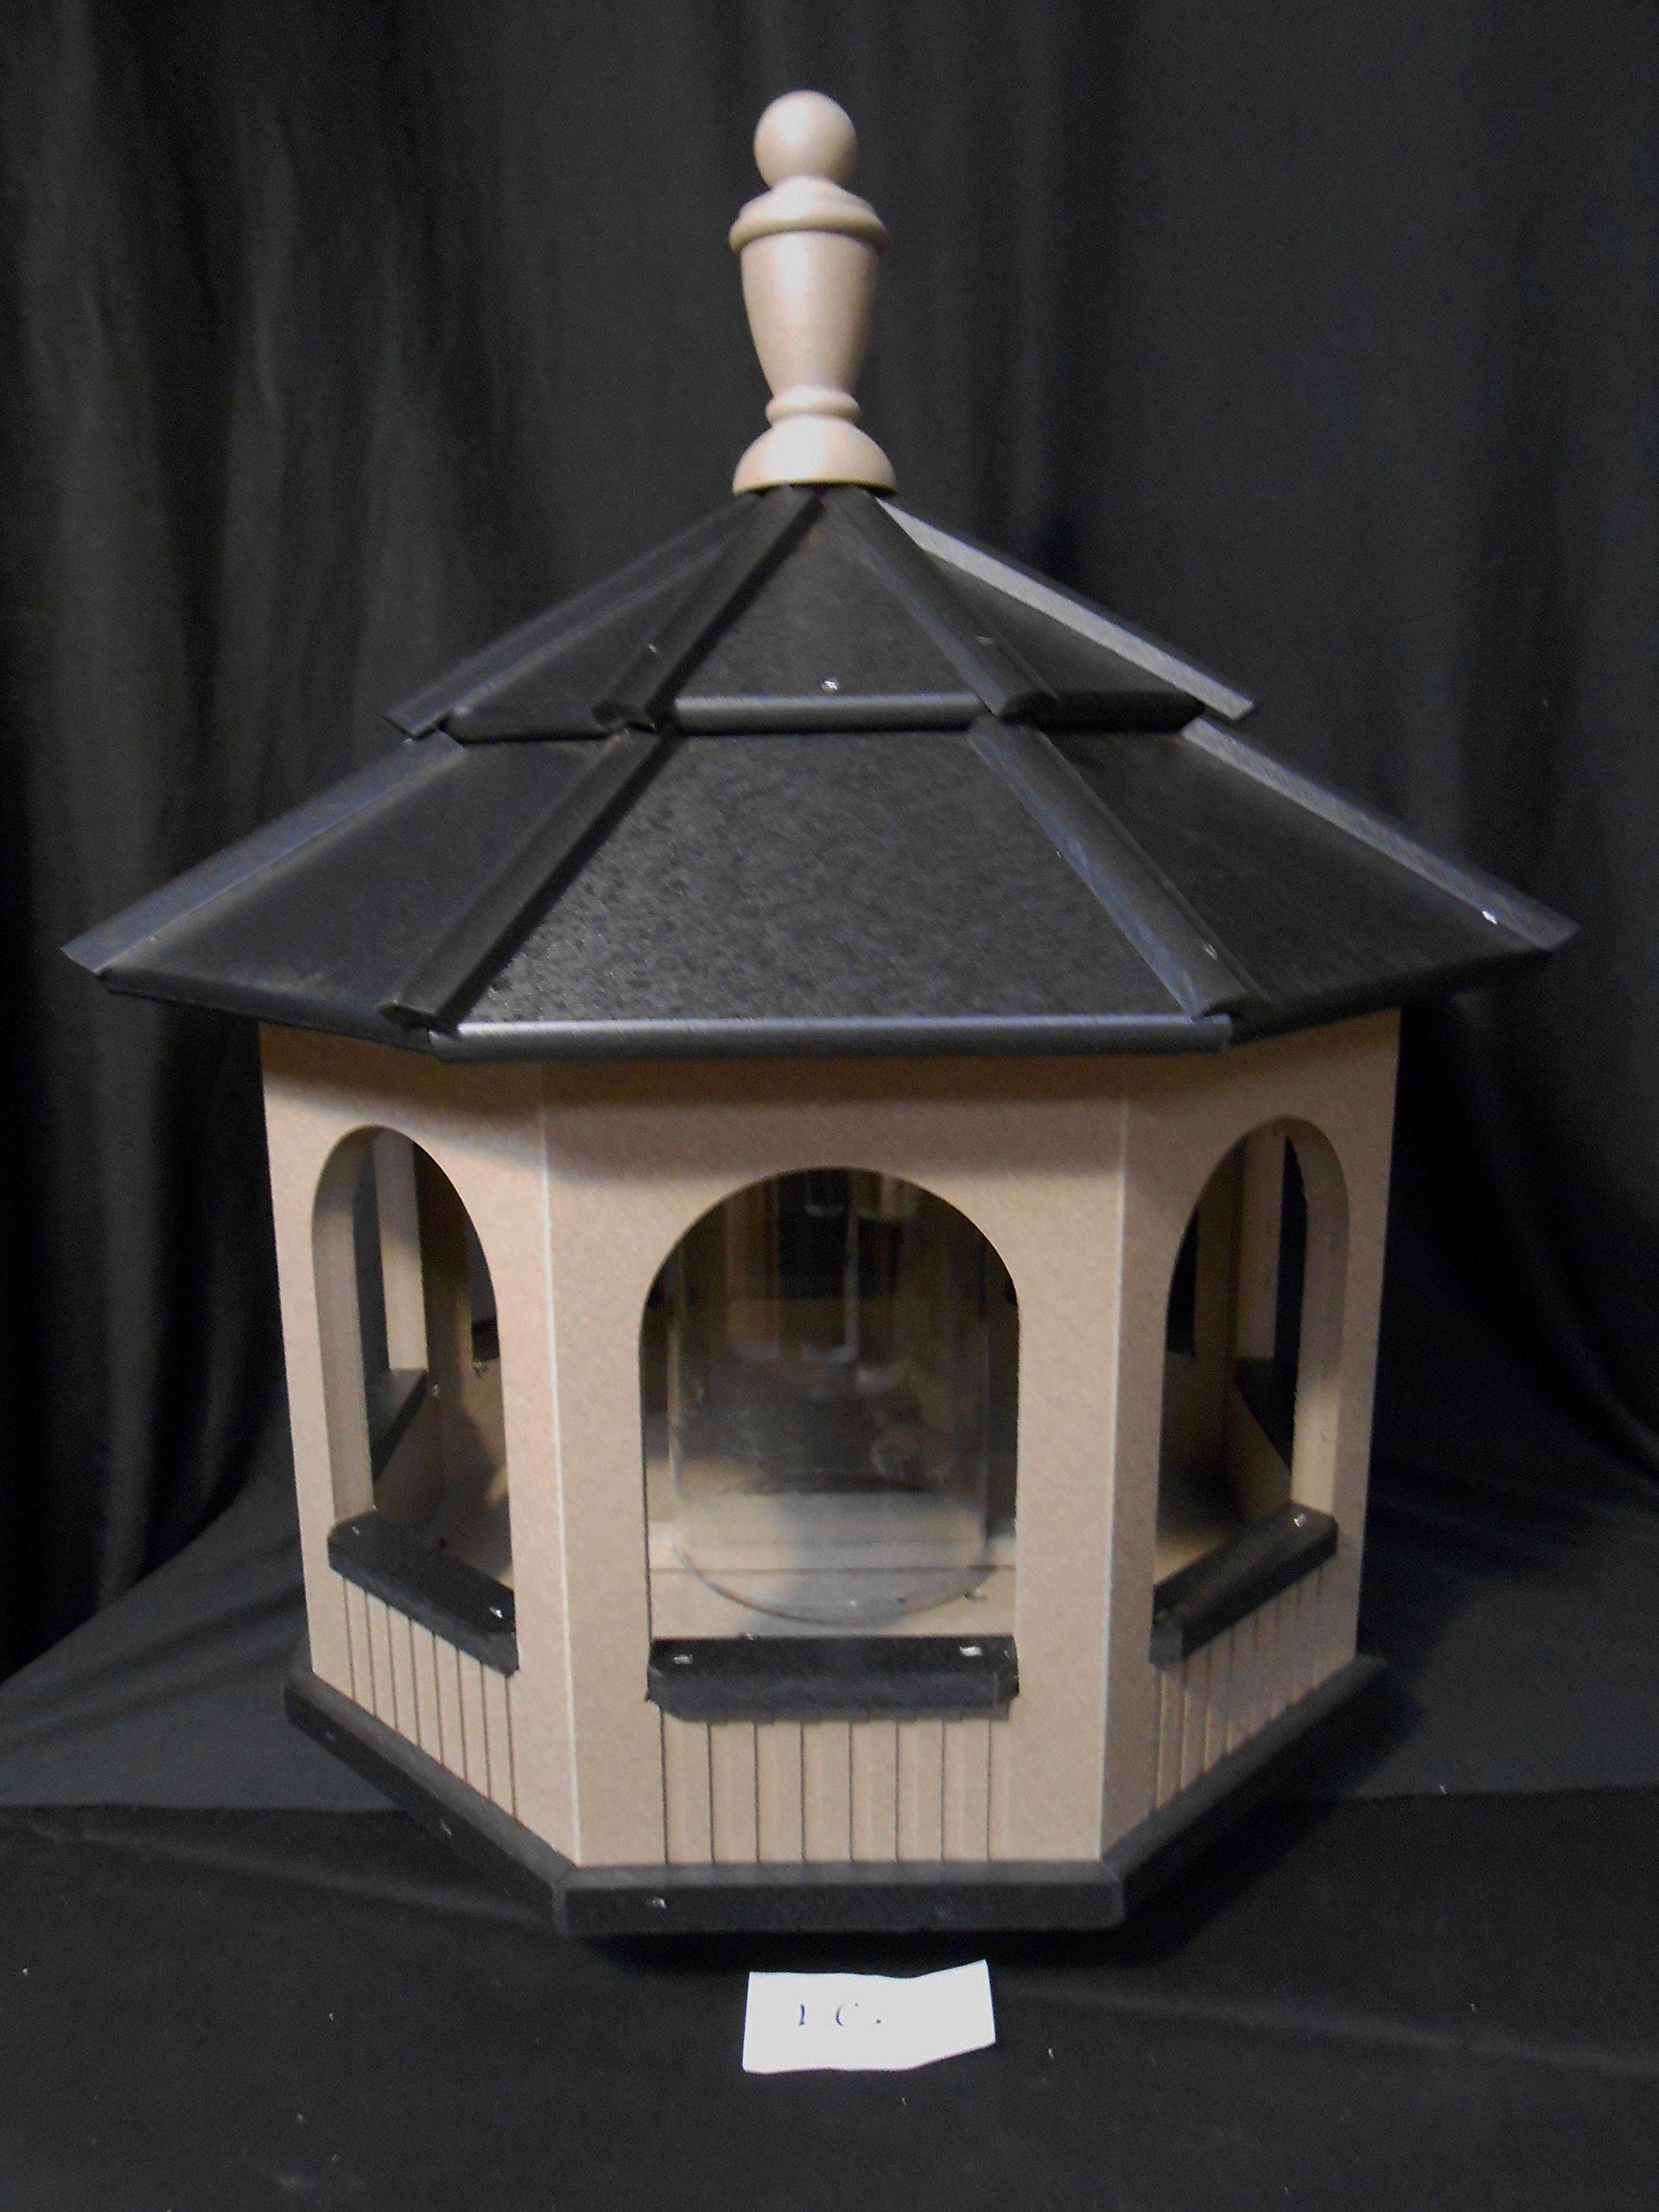 Large Gazebo Vinyl Bird Feeder Amish Homemade Handmade Handcrafted Clay & Black